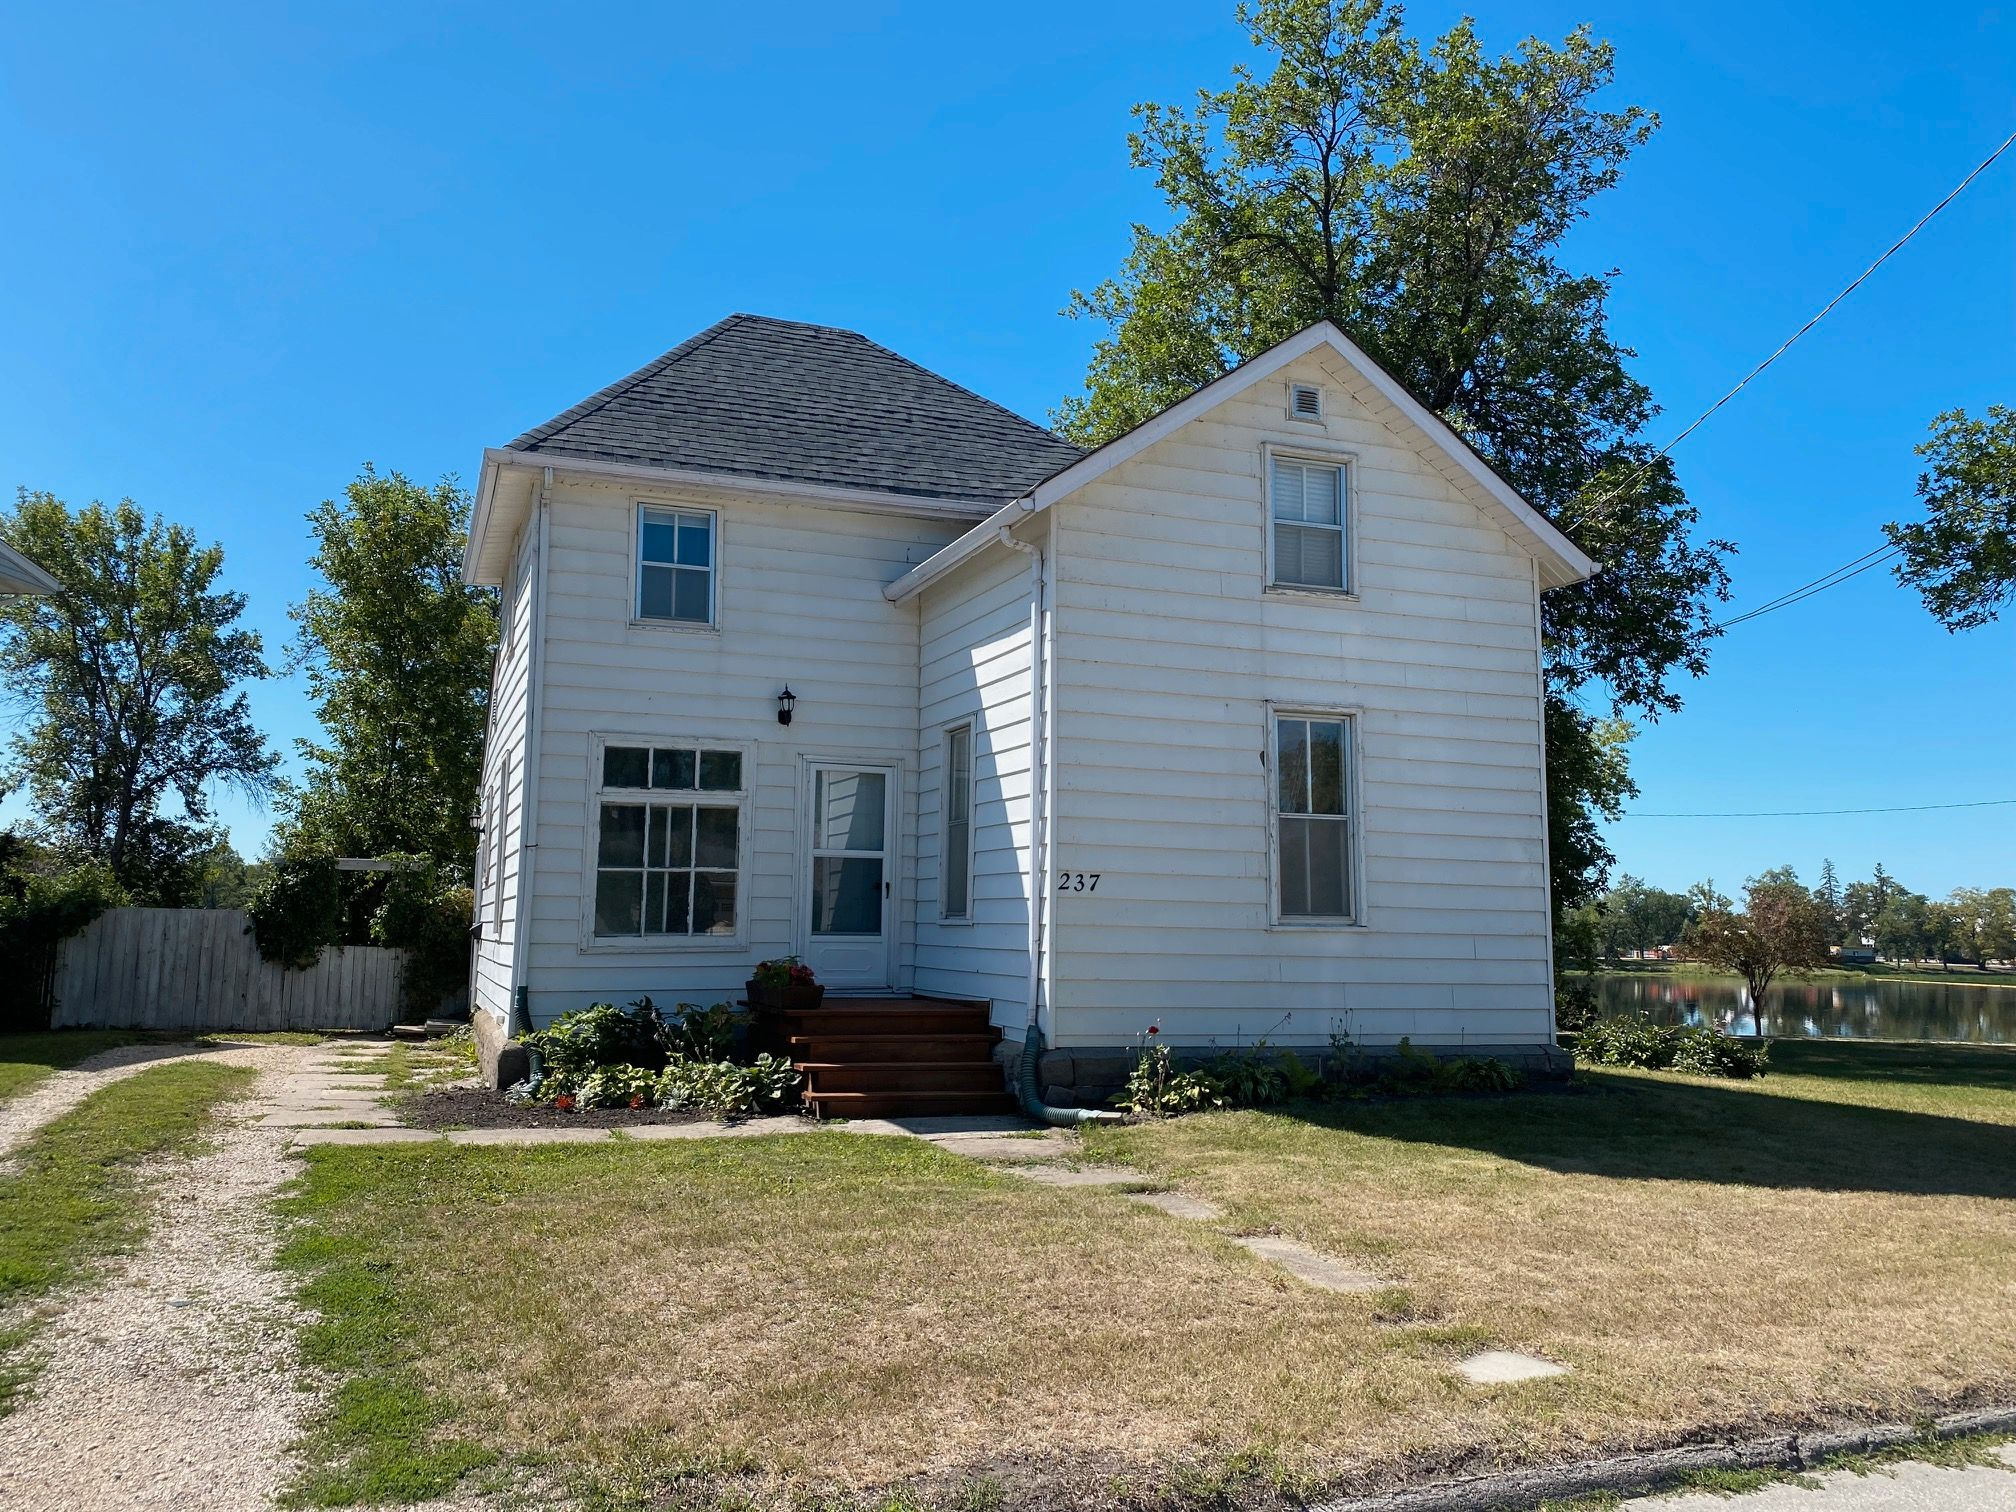 Main Photo: 237 Portage Ave in Portage la Prairie: House for sale : MLS®# 202120515